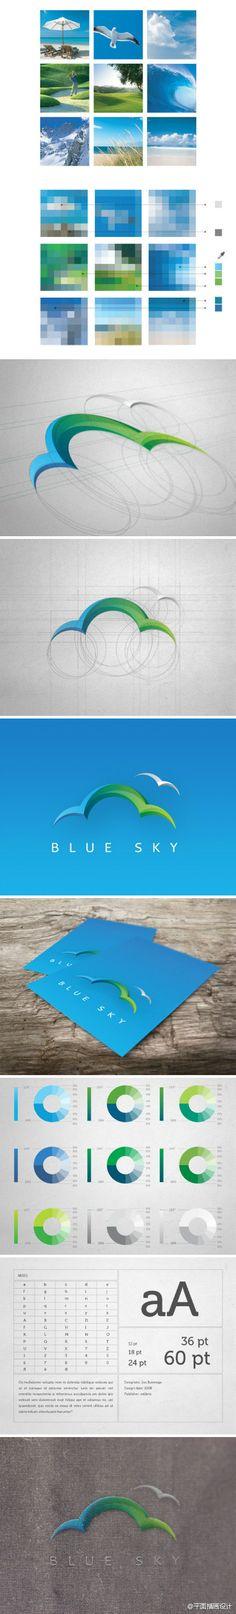 blue sky - logo idea